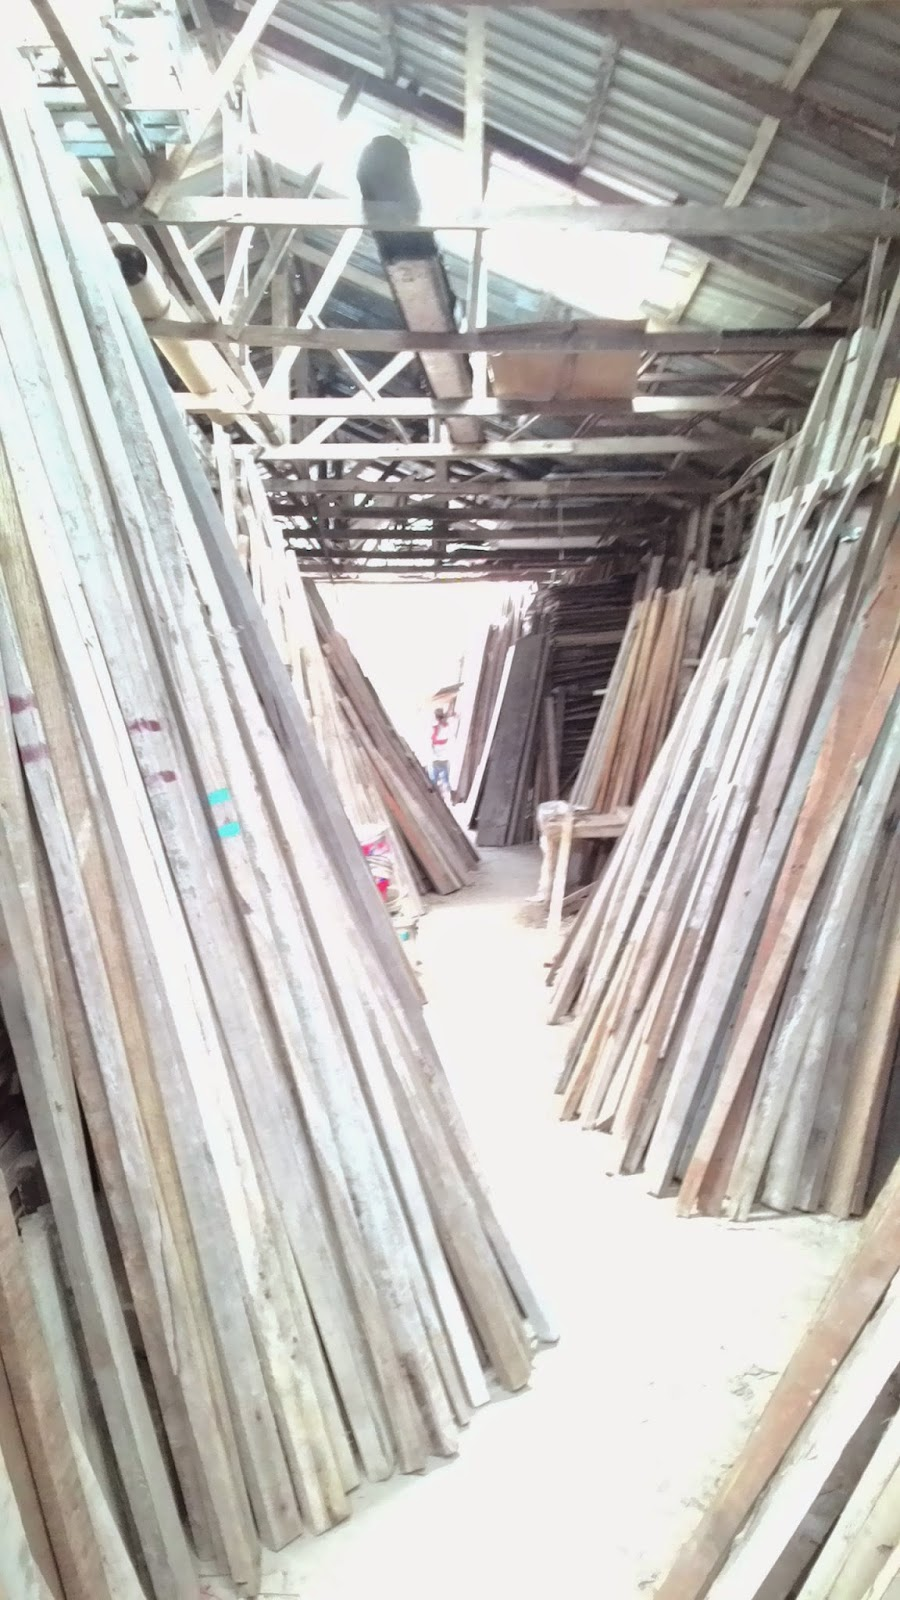 Serbuan Seterusnya Ke Kedai Kayu Terpakai Cadang Nak Cari Untuk Wat Deck Kat Ladang Aku Tu Kononlah Tapi Tujuan Utama Eln Rumput Liar